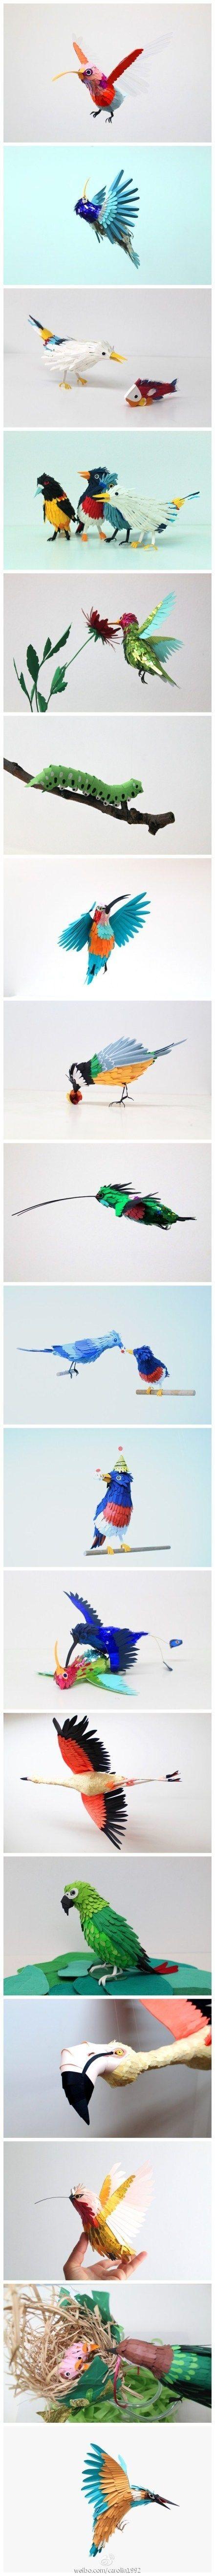 Colombian artist Diana Beltran Herrera and her paper art works.